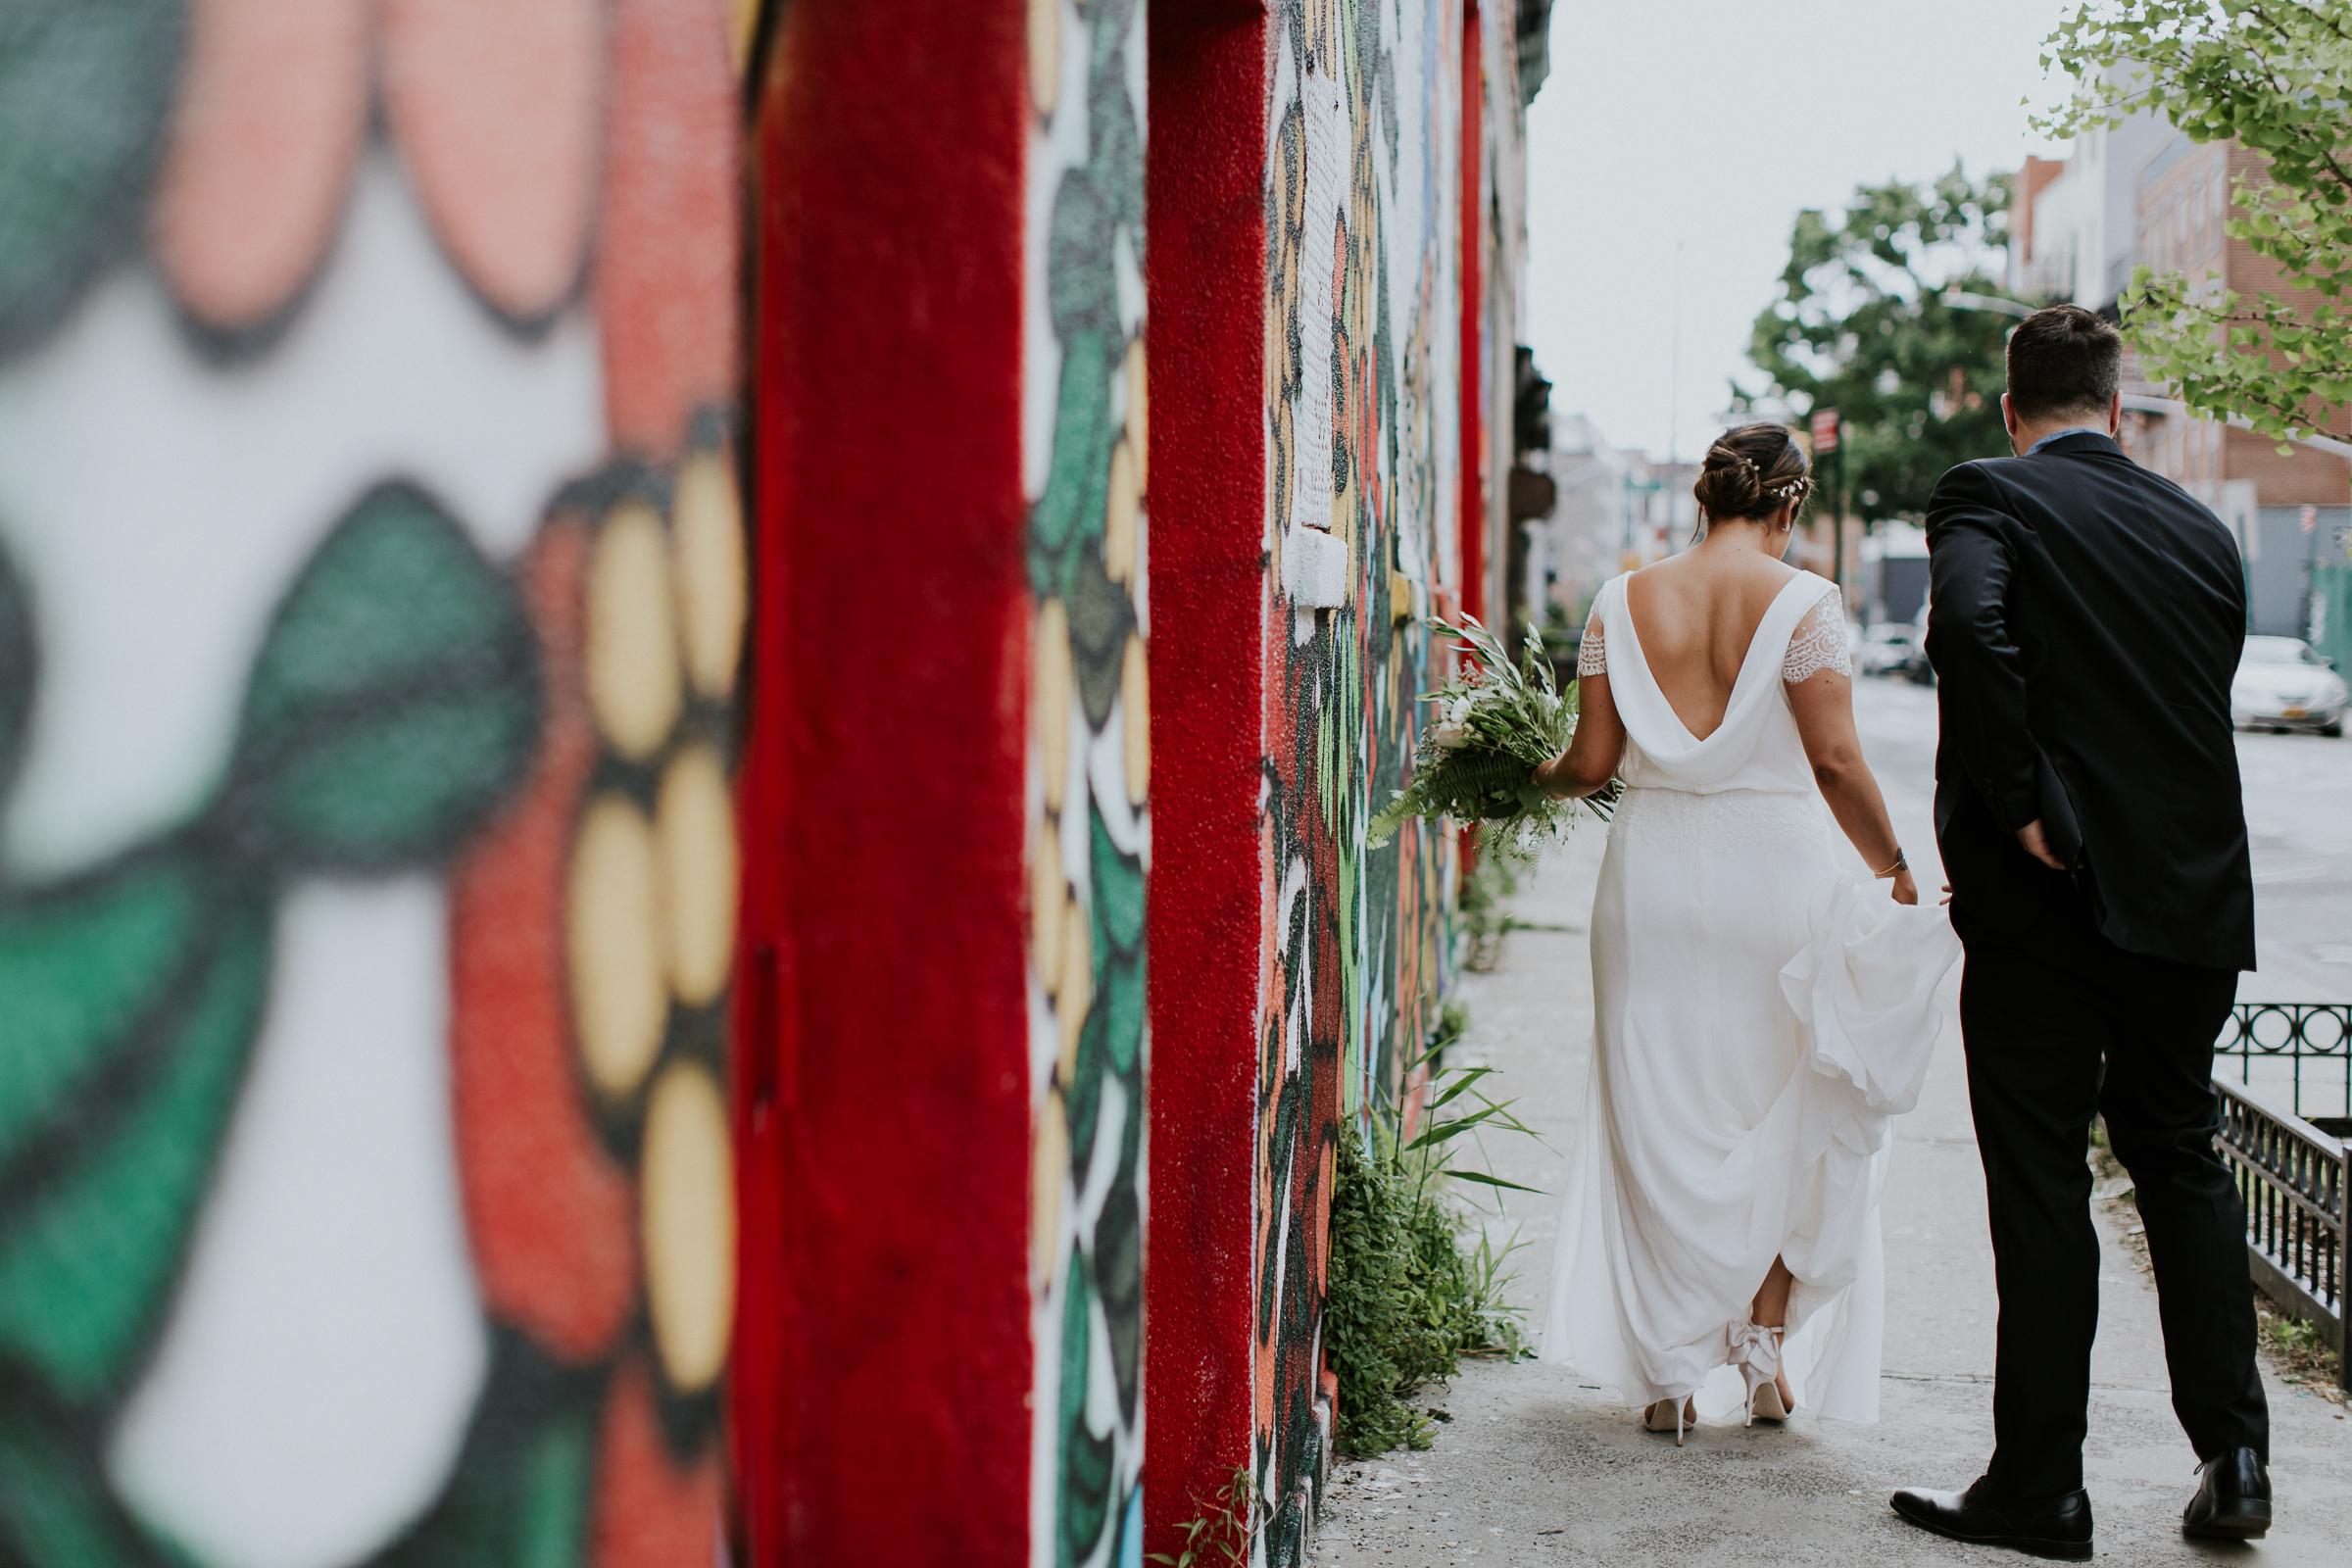 501-Union-Brooklyn-Fine-Art-Documentary-Wedding-Photographer-50.jpg